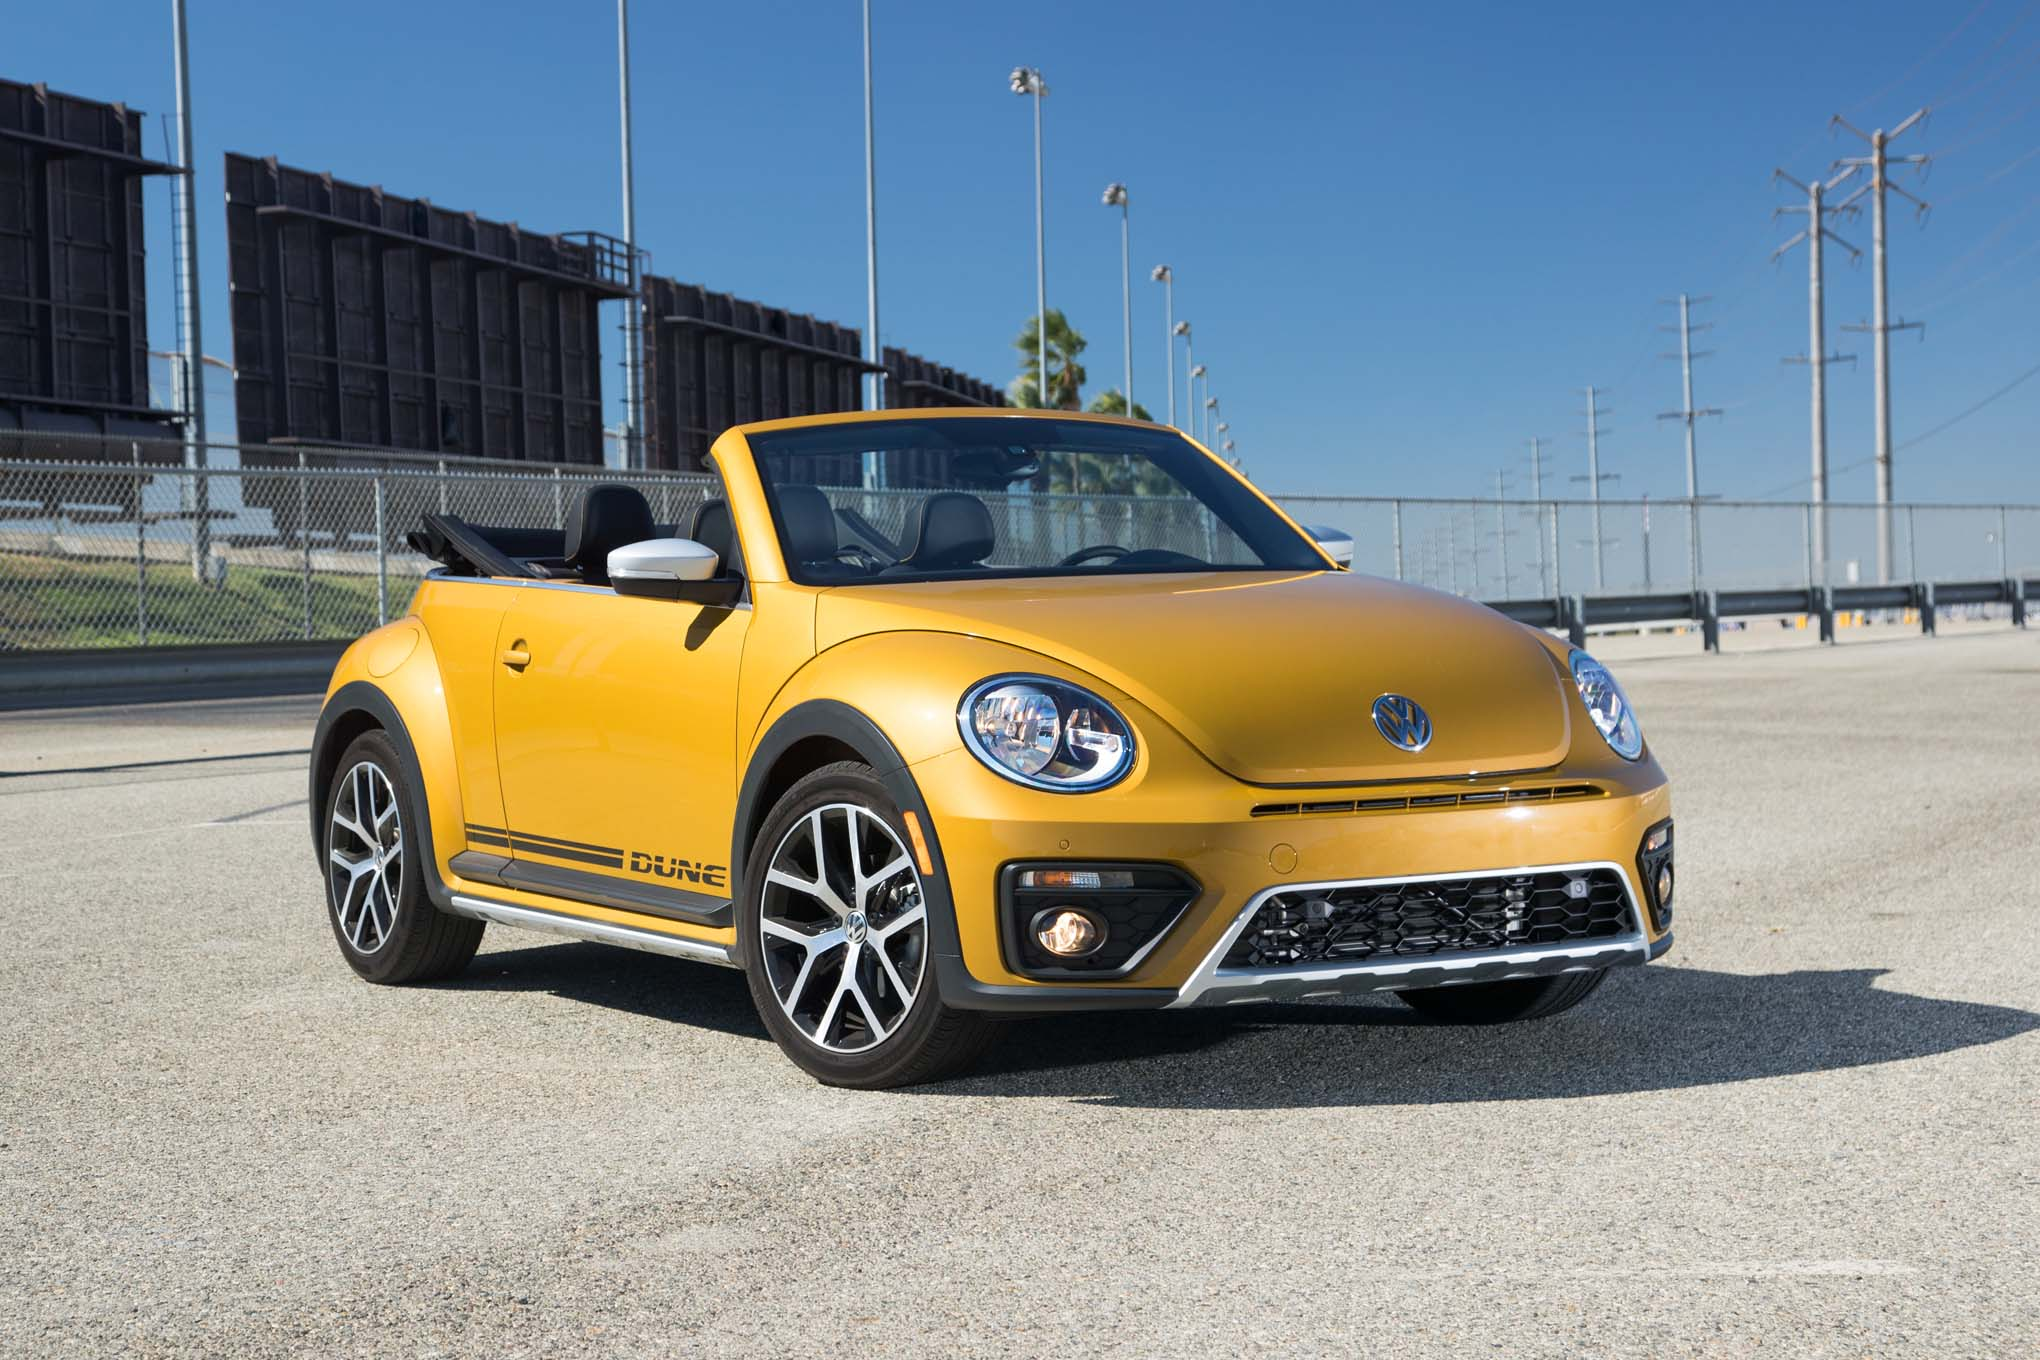 Volkswagen Beetle Scirocco May Get The Axe Automobile